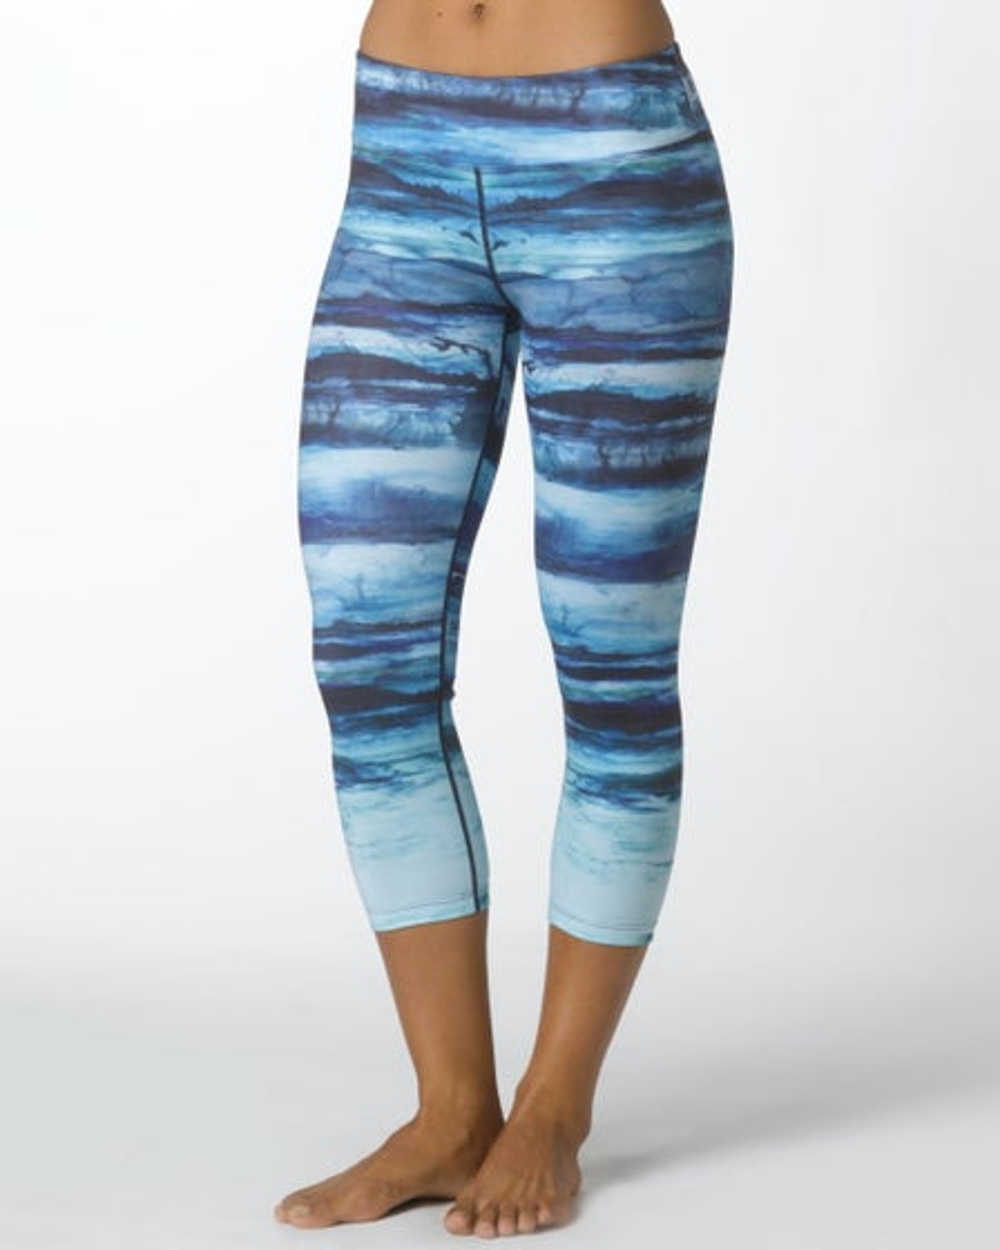 2015 Prana Activewear Roxanne Capri in Teal Tide